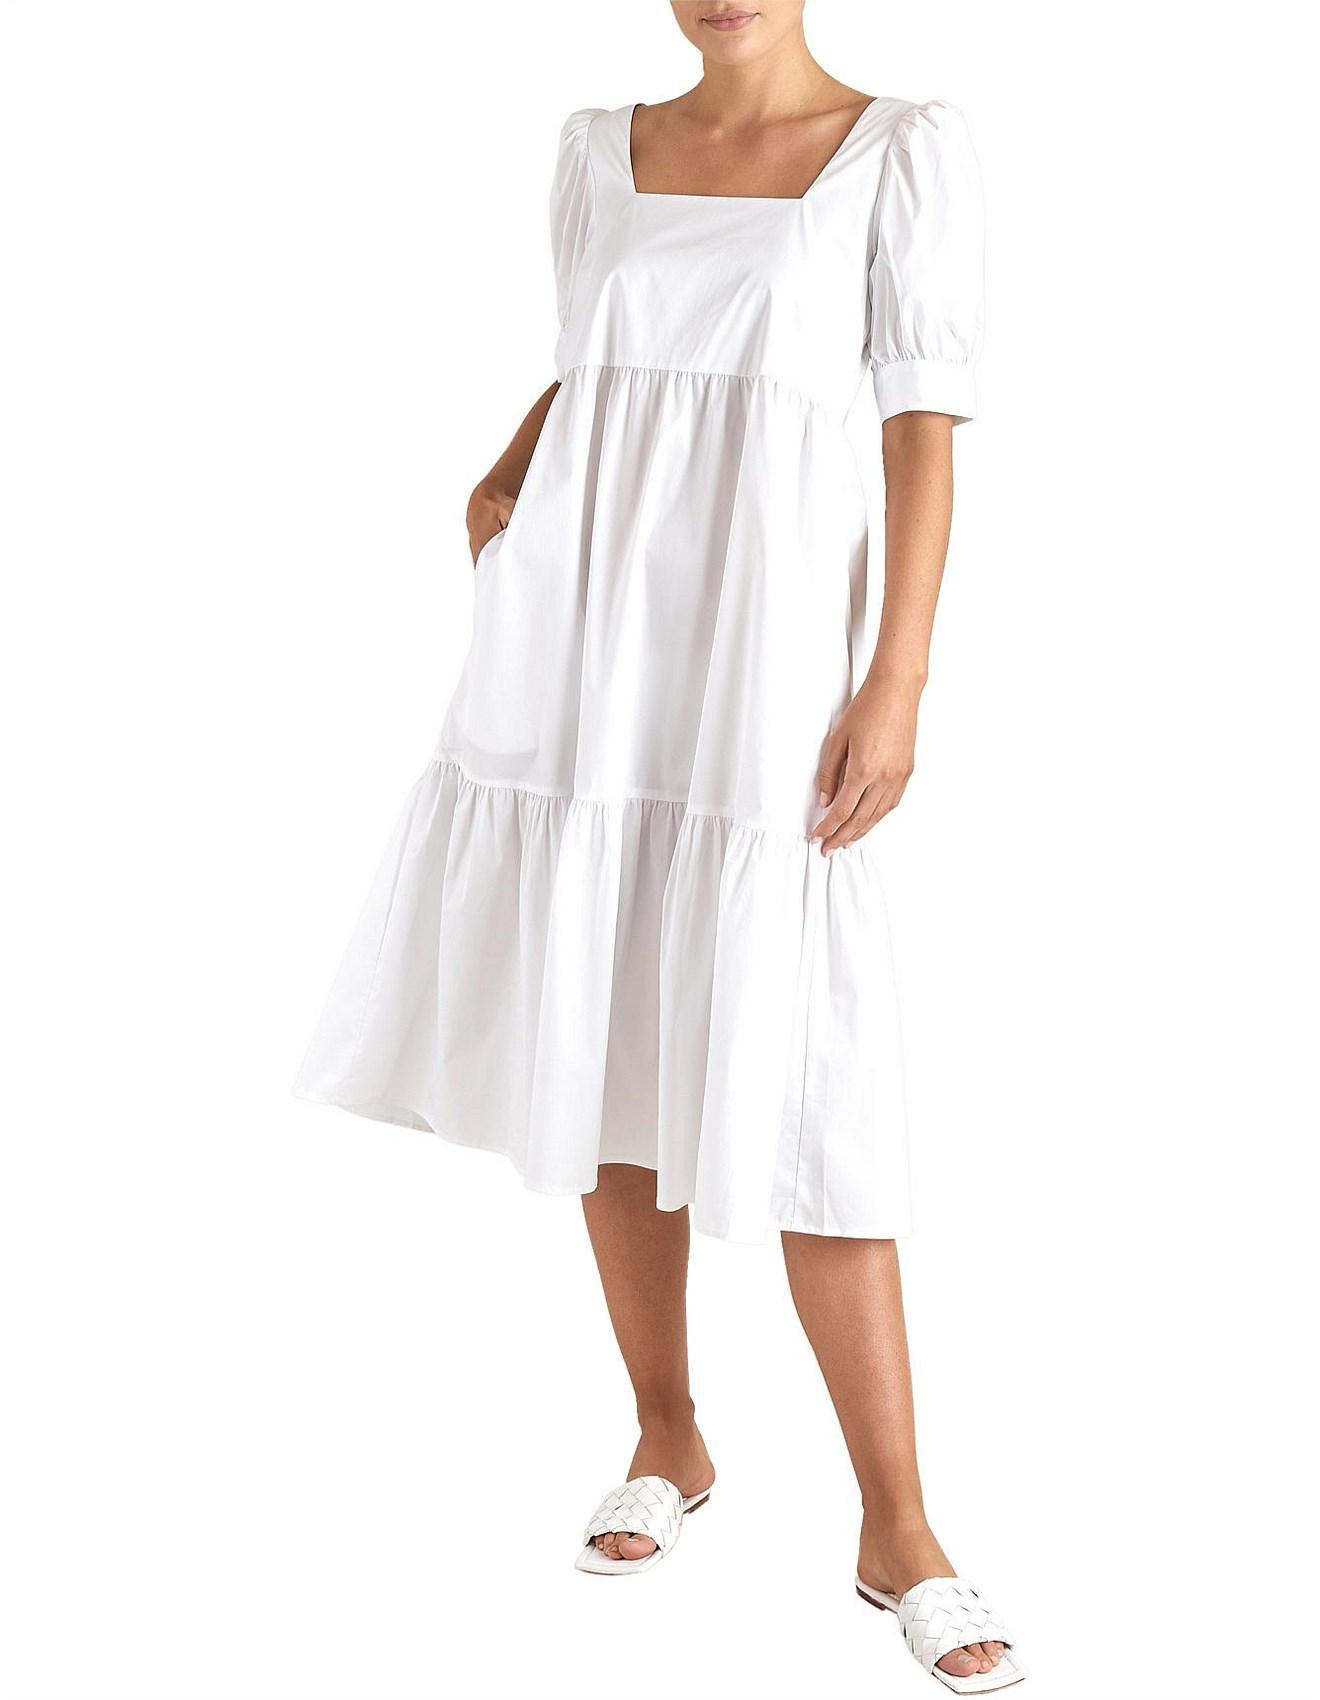 Buy poplin dress midi cheap online